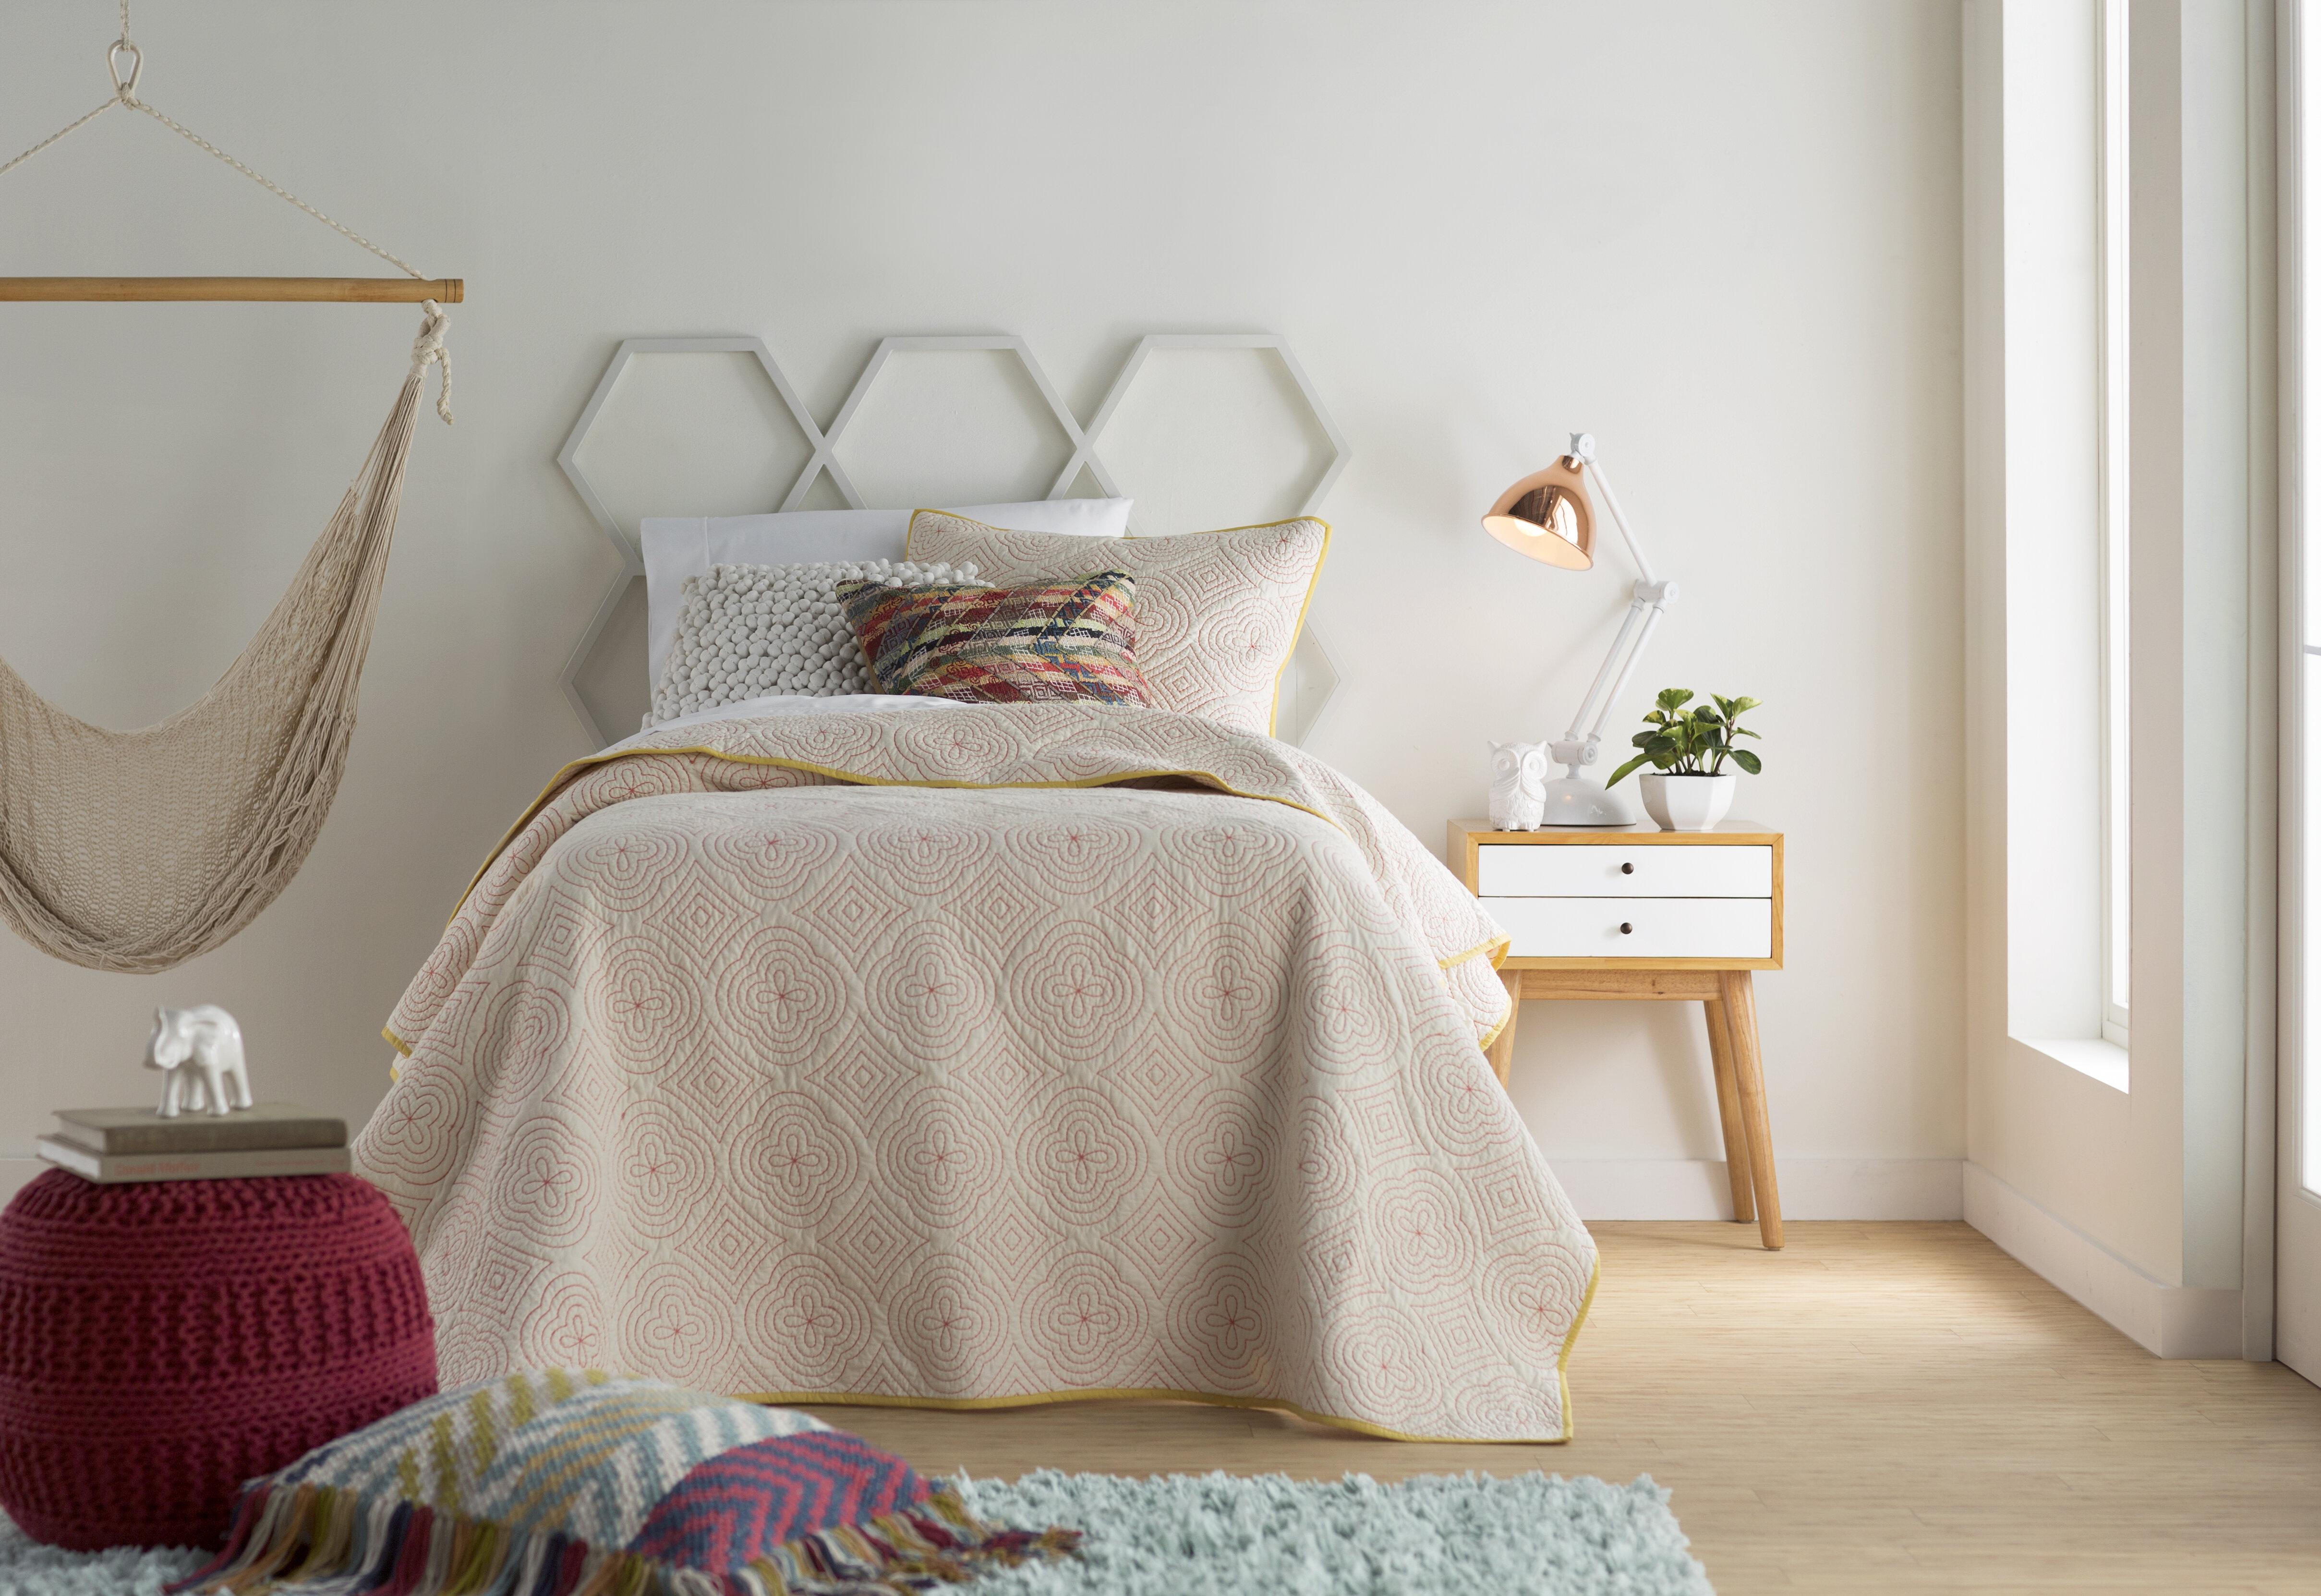 17 Trendy Teen Room Ideas Wayfair